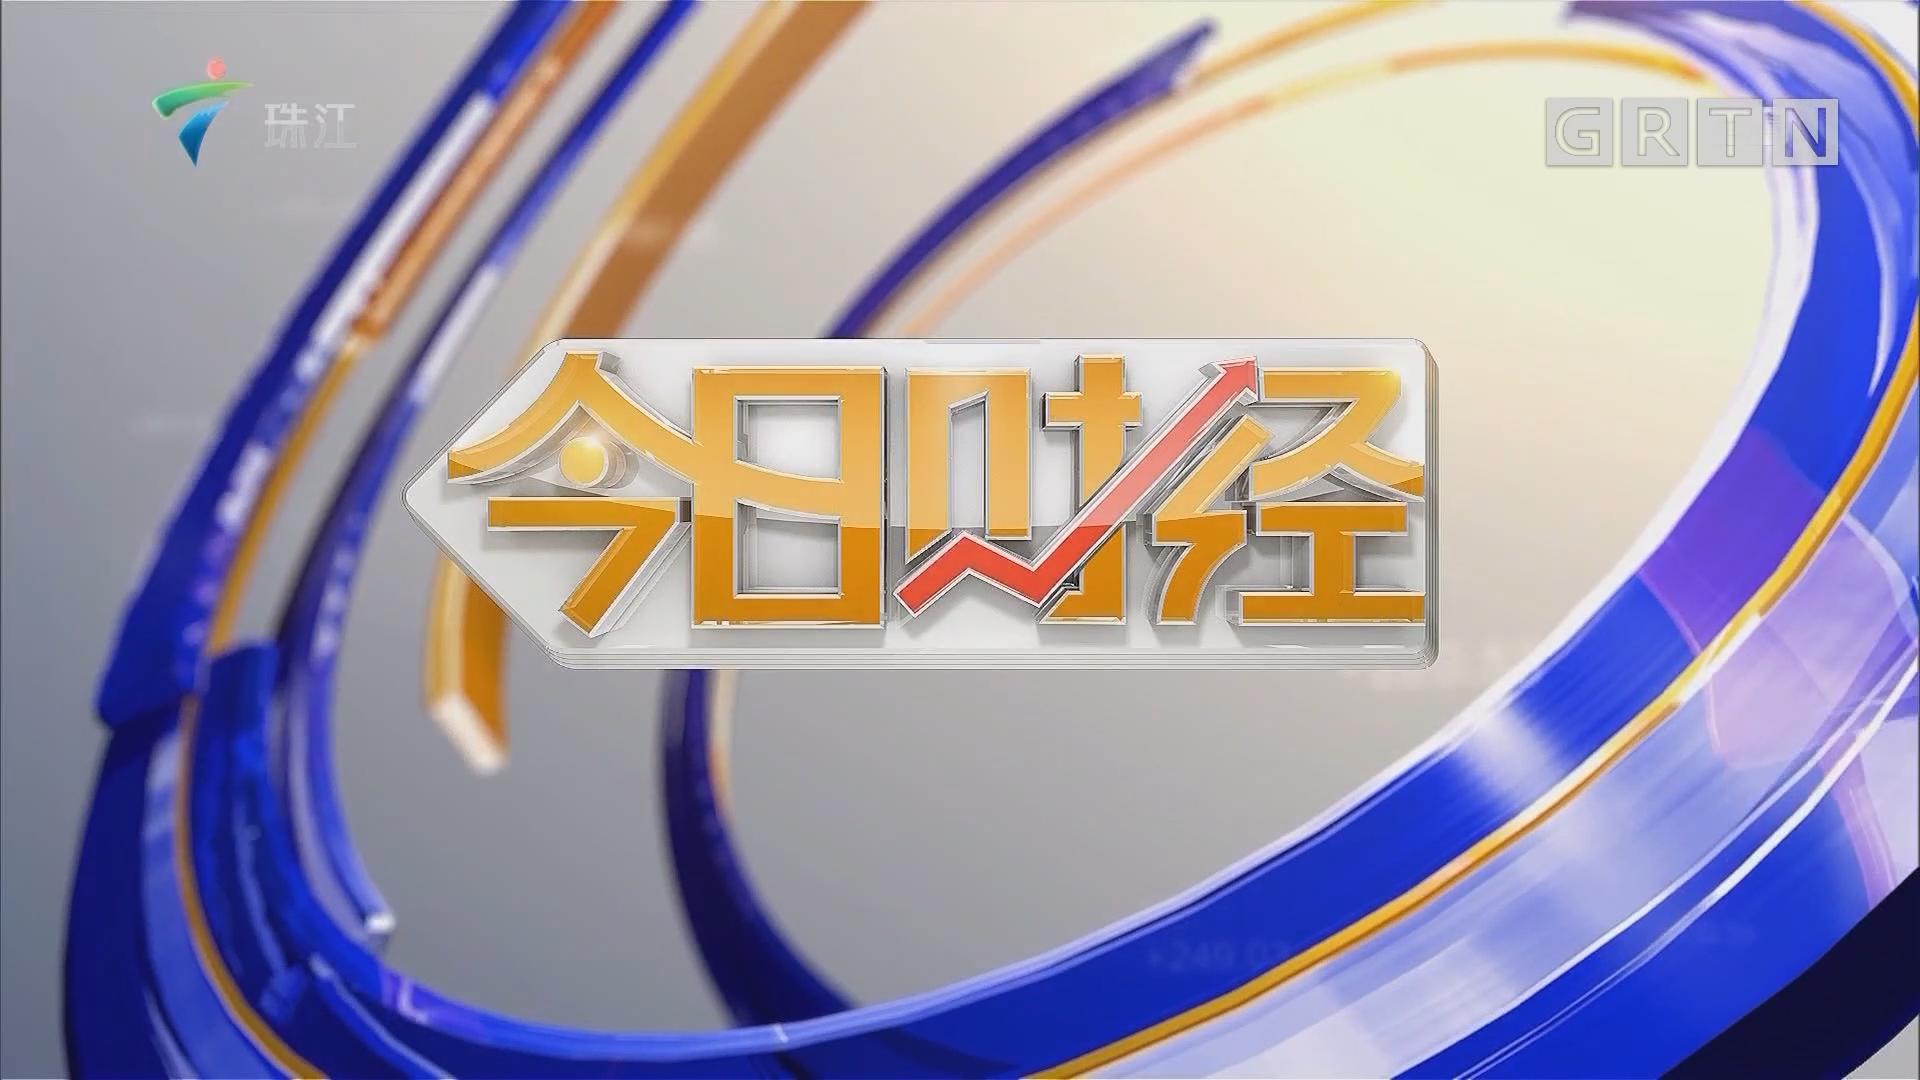 [HD][2019-01-07]今日财经:首届粤港澳大湾区发展论坛举行